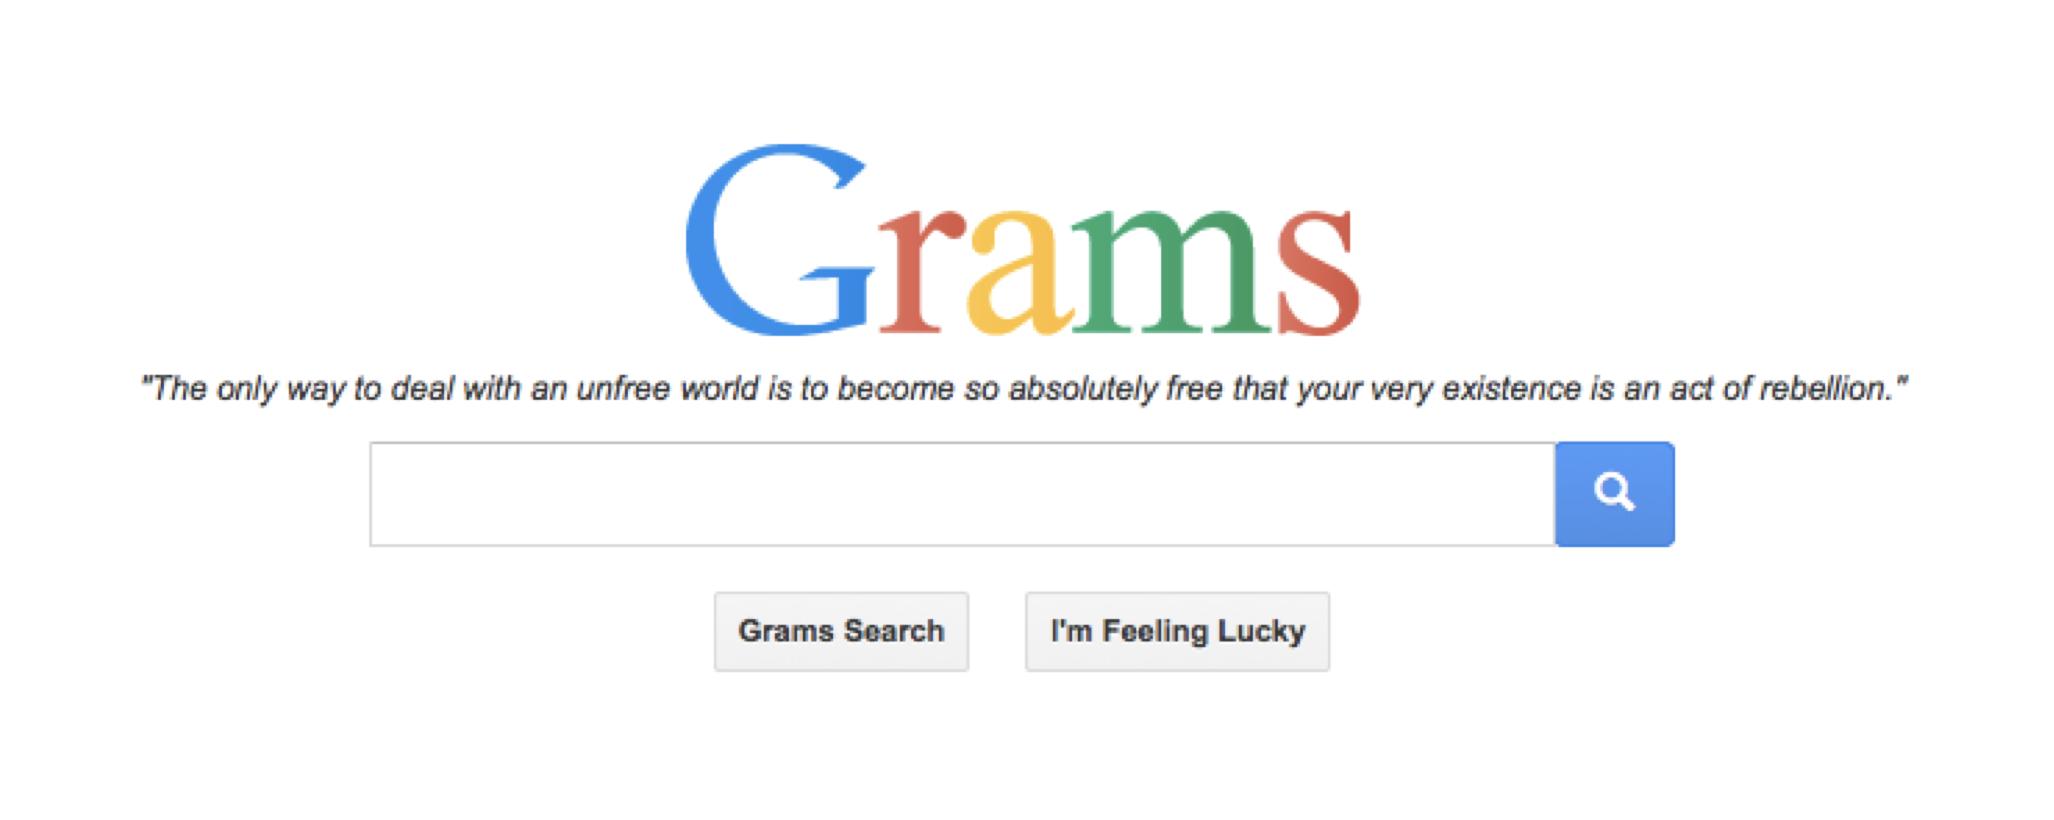 Grams darknet search отзывы о тор браузере форум hidra